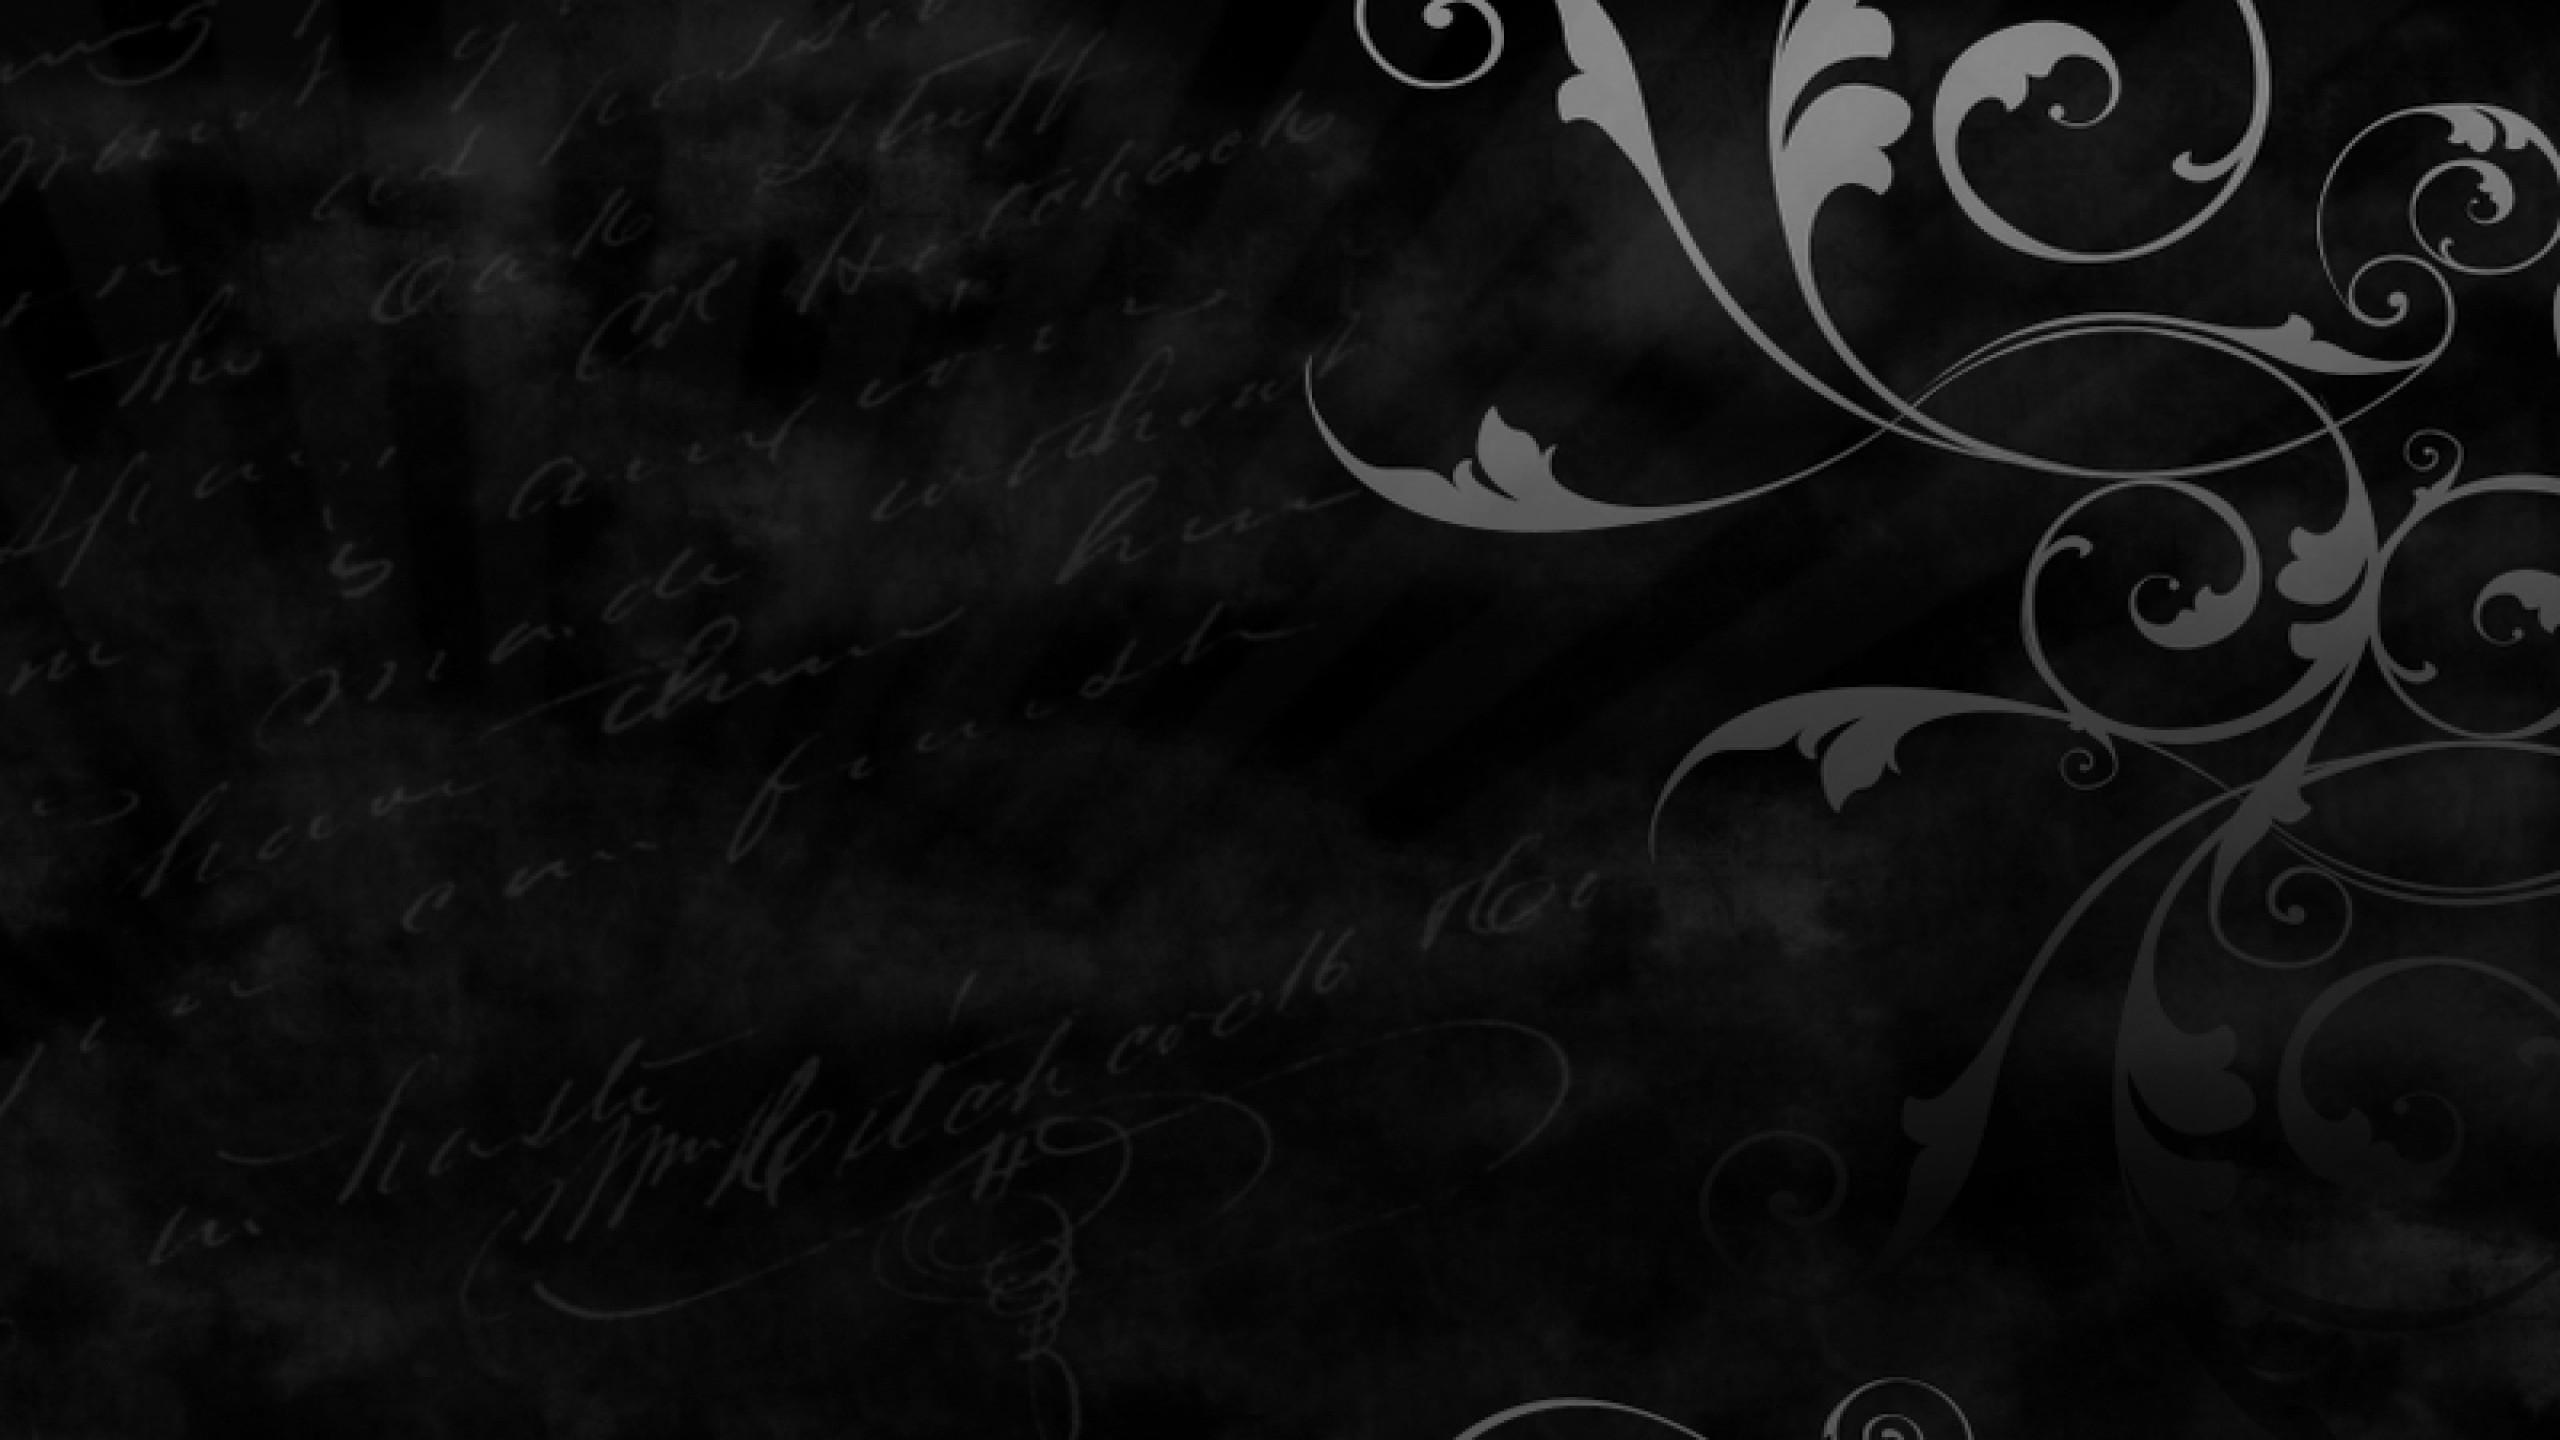 hd abstract black wallpaper